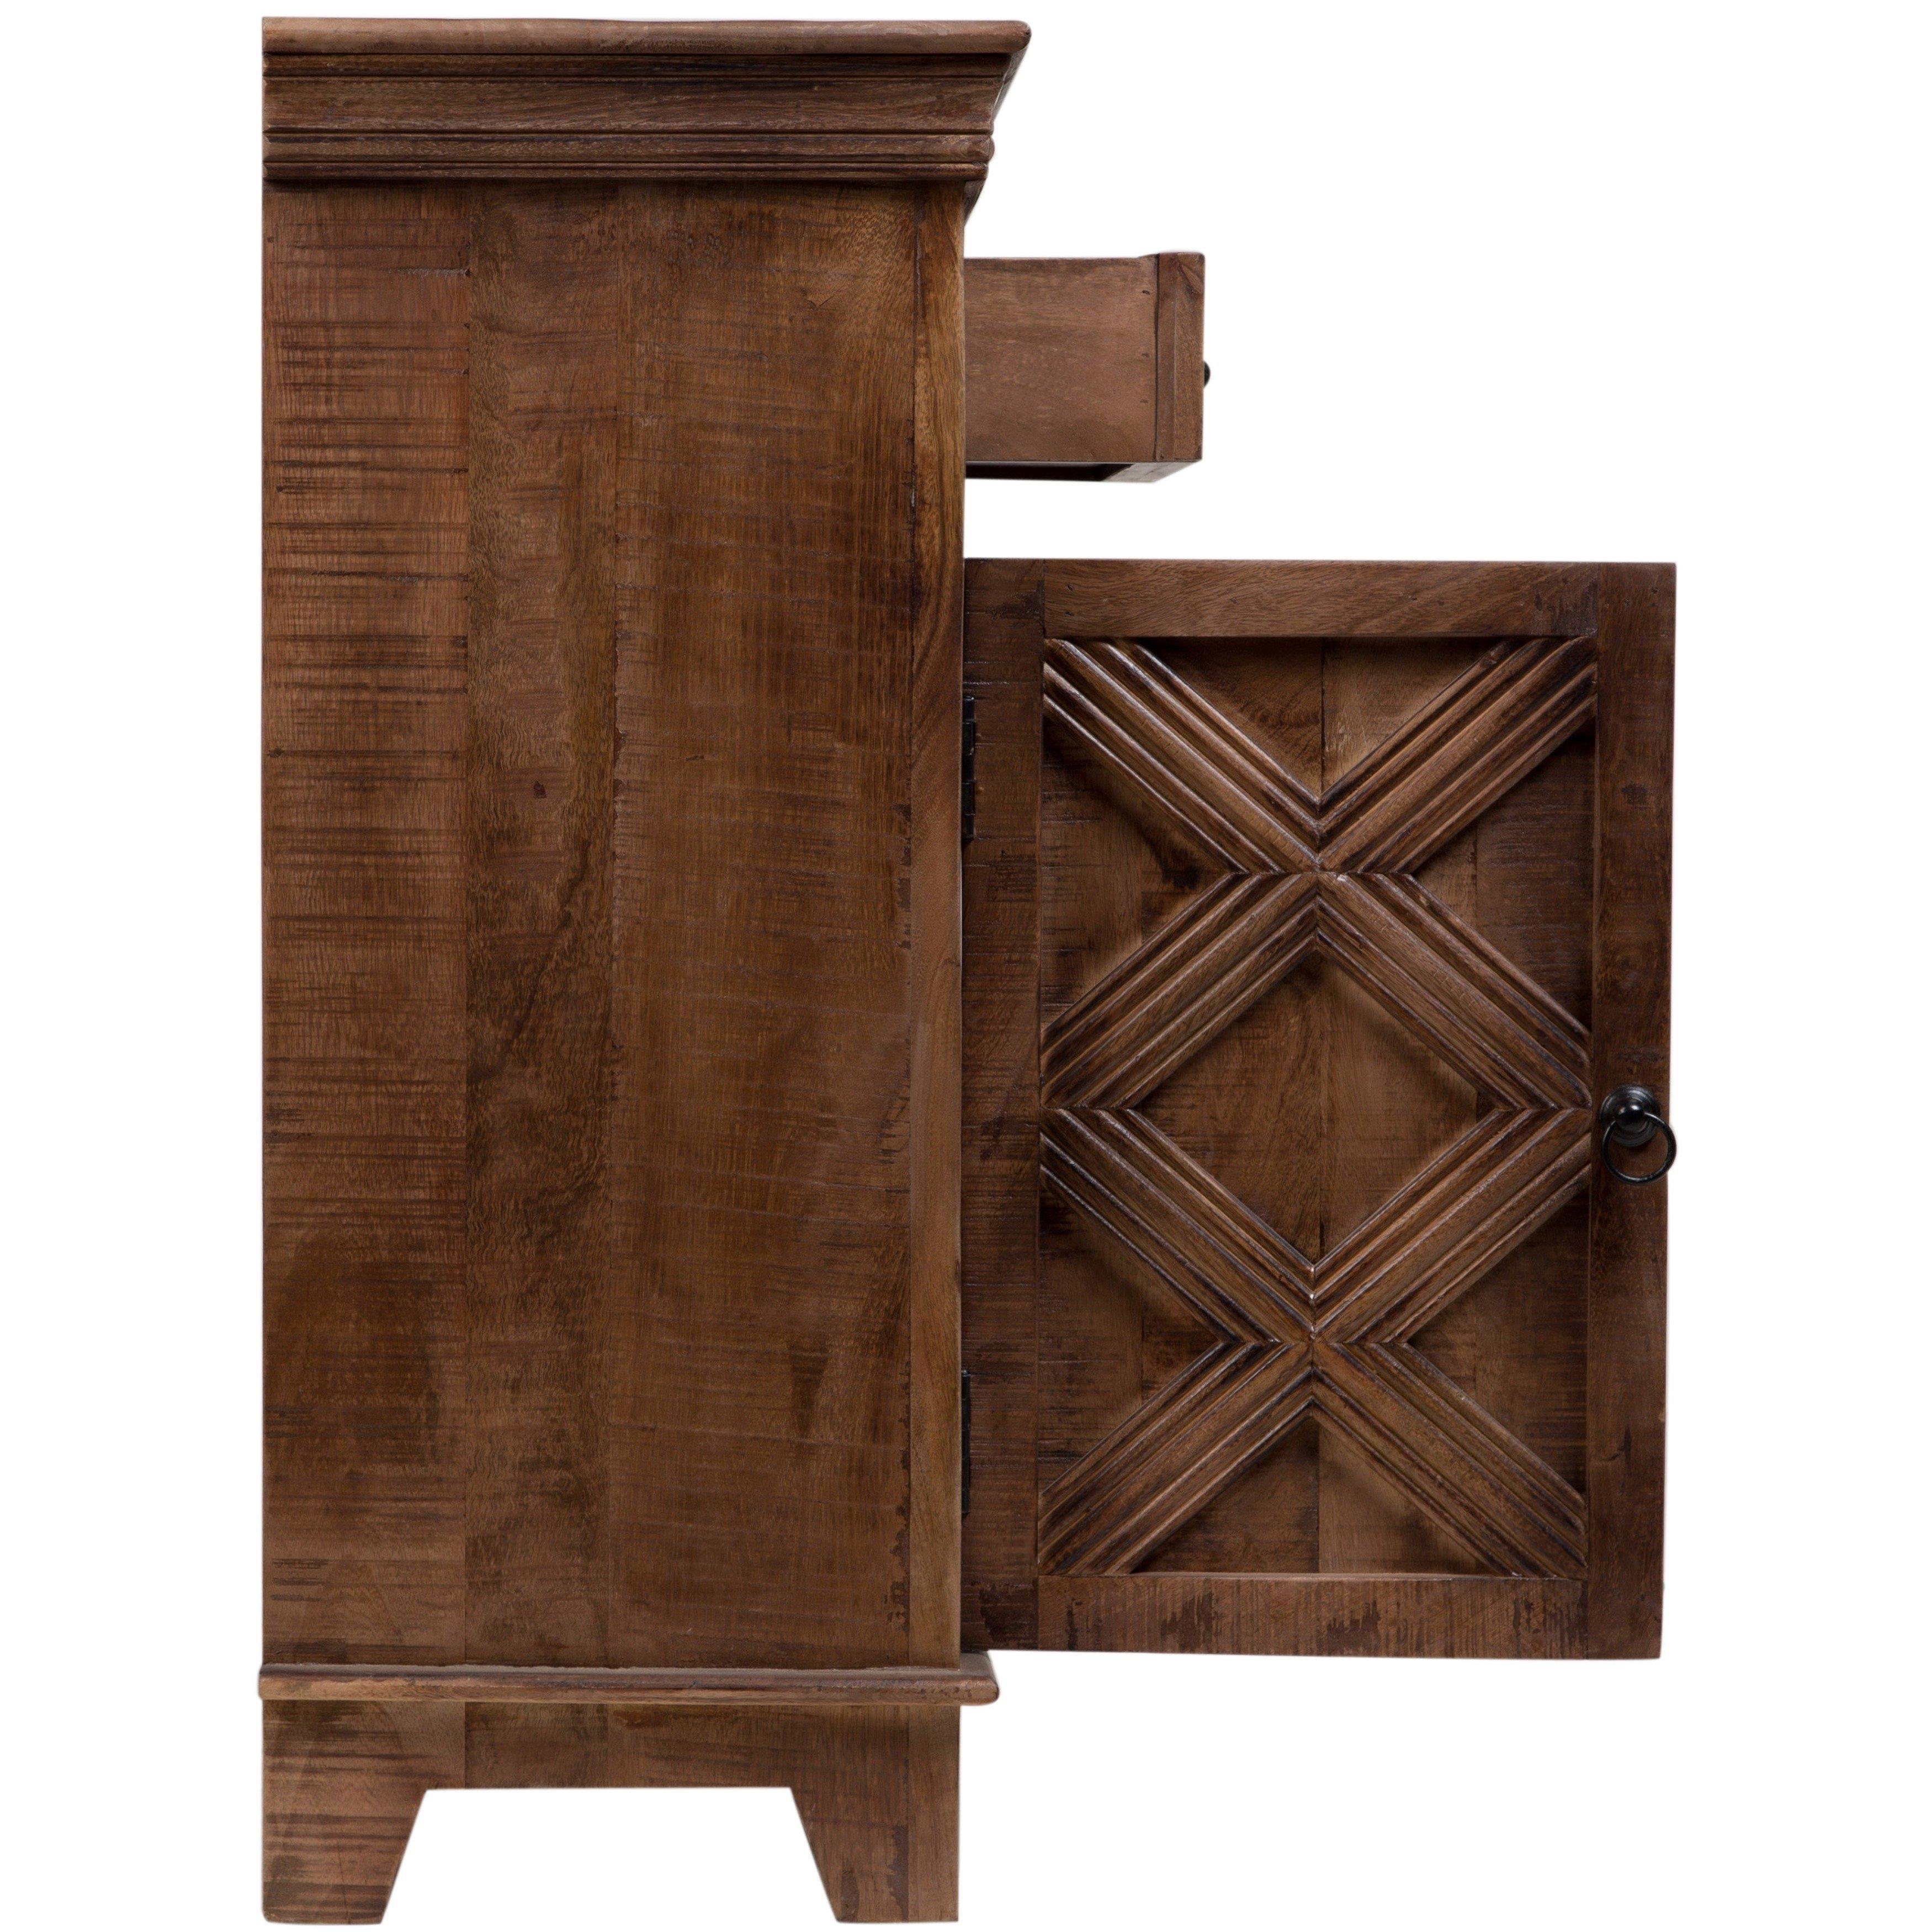 Shop Handmade Wanderloot Plantation Mango Wood 2-Door, 2-Drawer in Mango Wood 2-Door/2-Drawer Sideboards (Image 24 of 30)